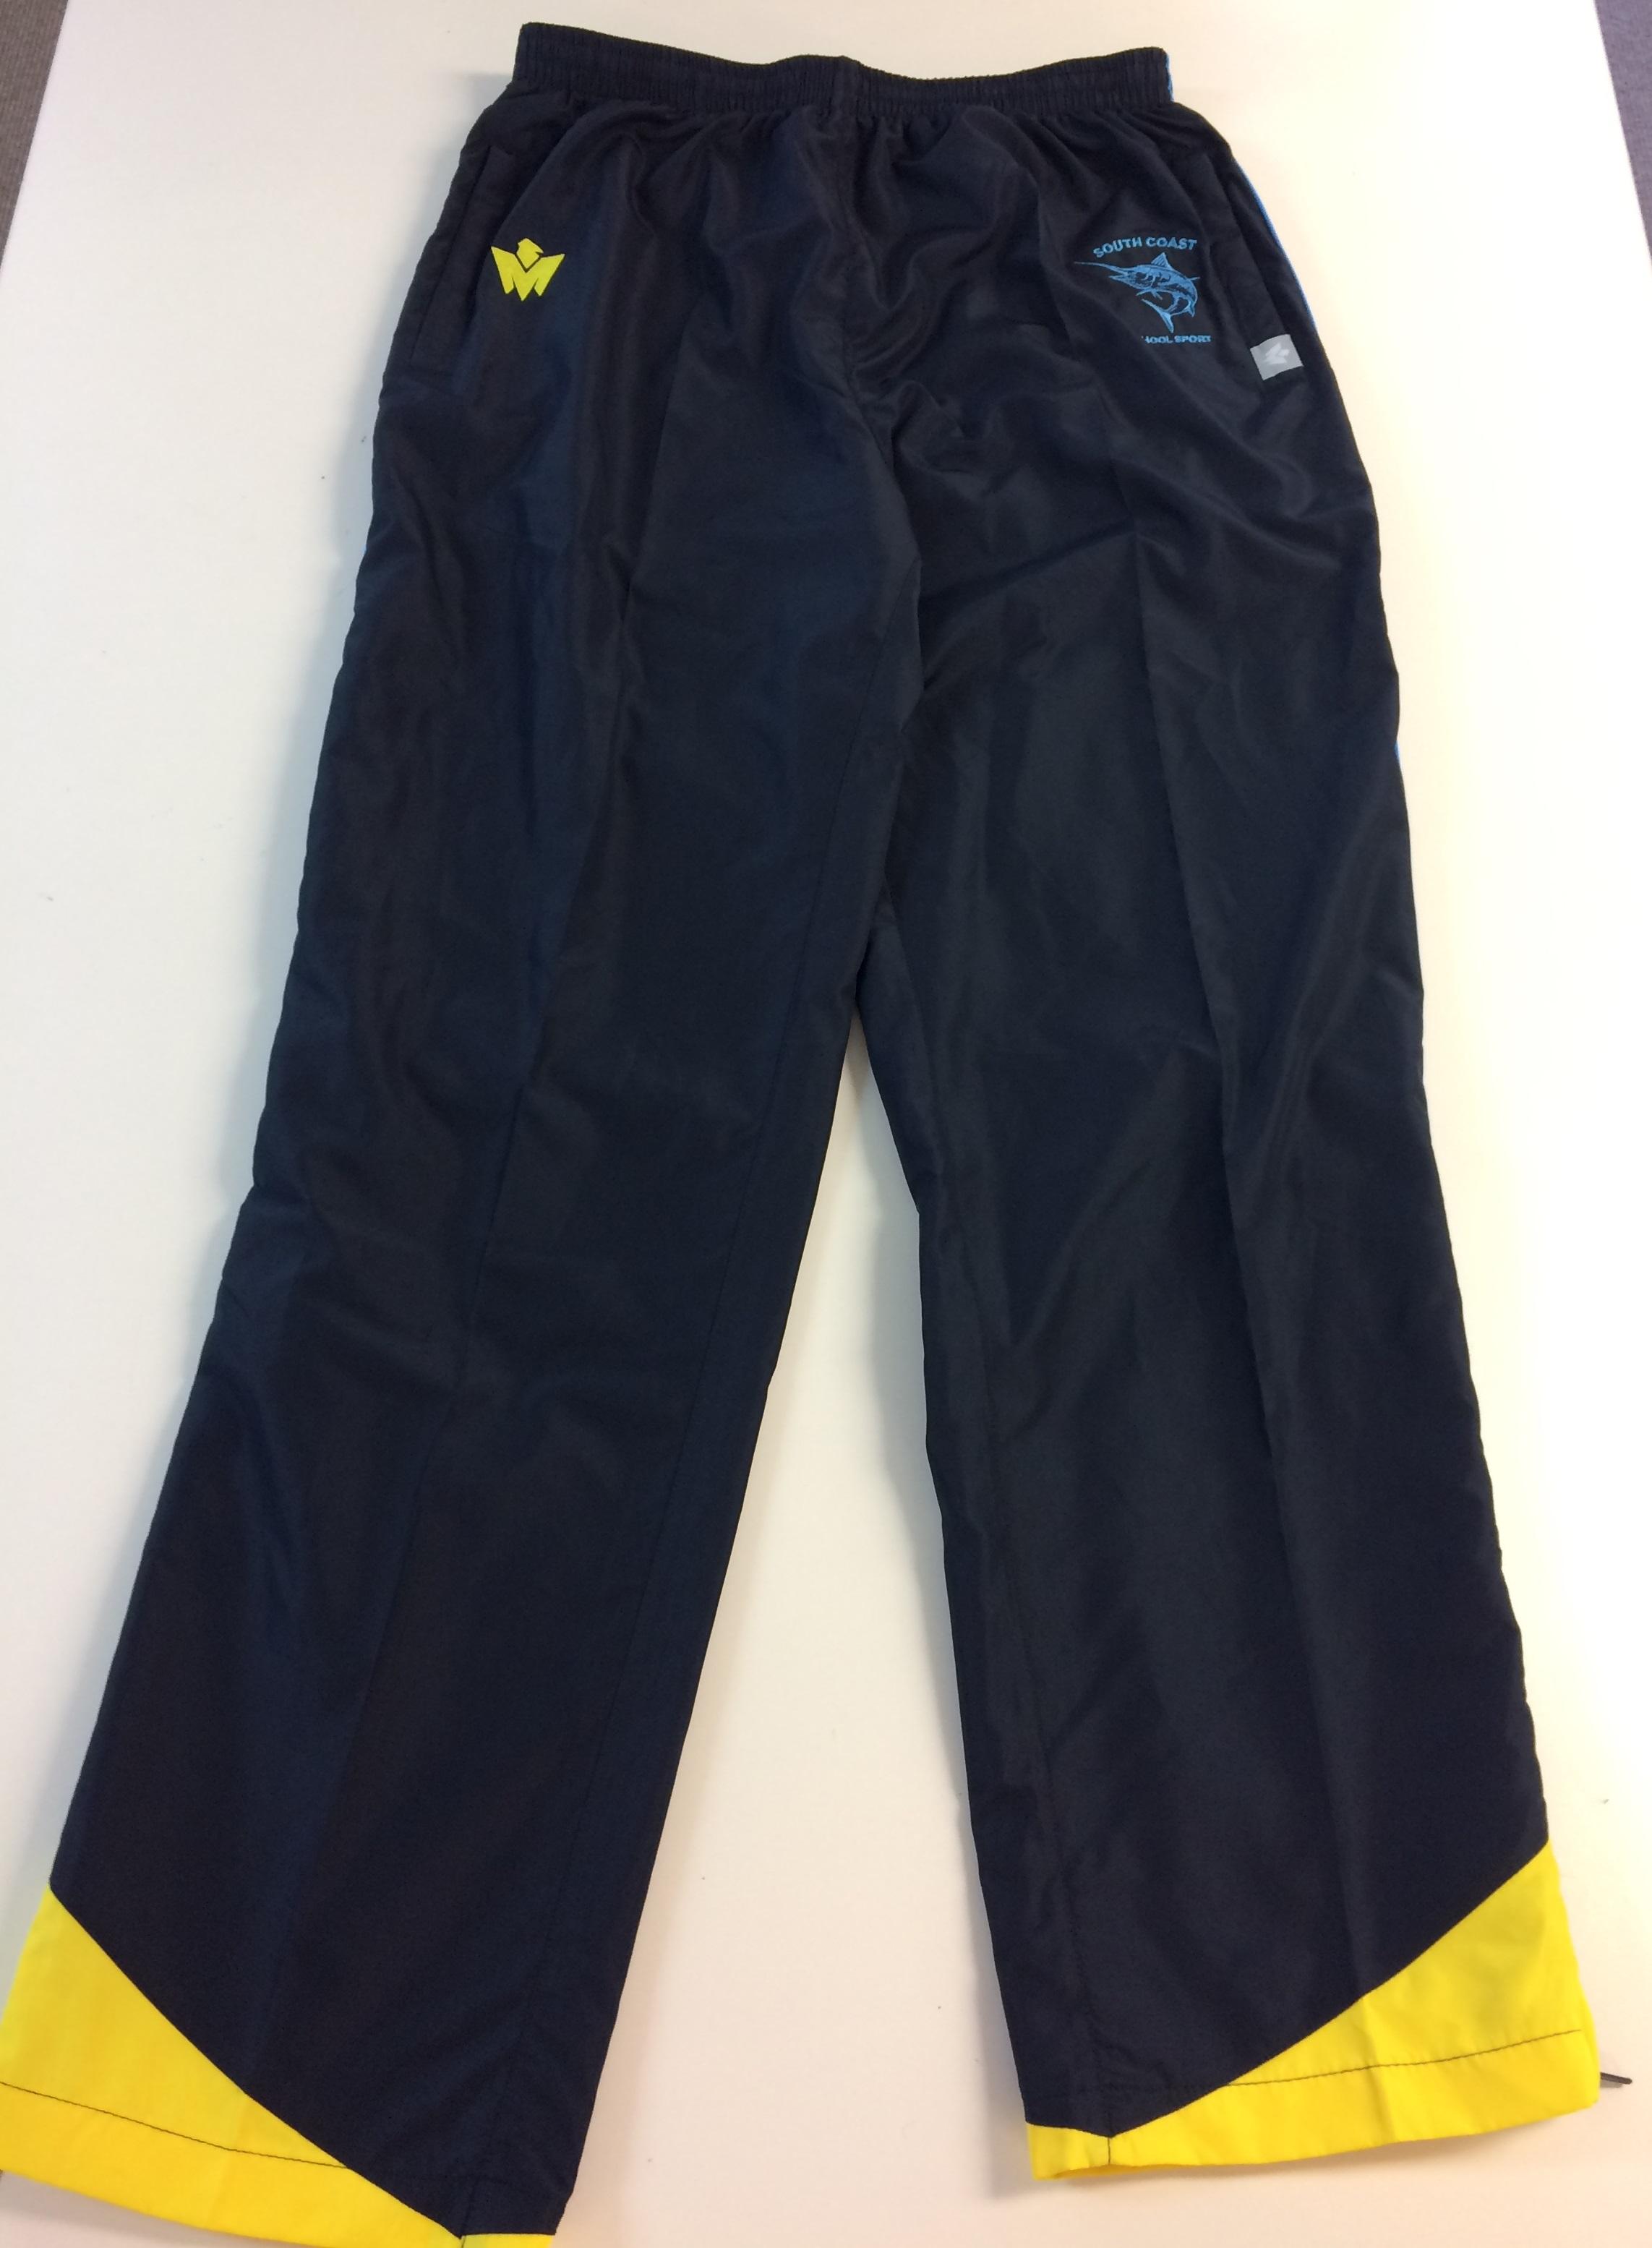 South Coast tracksuit pants